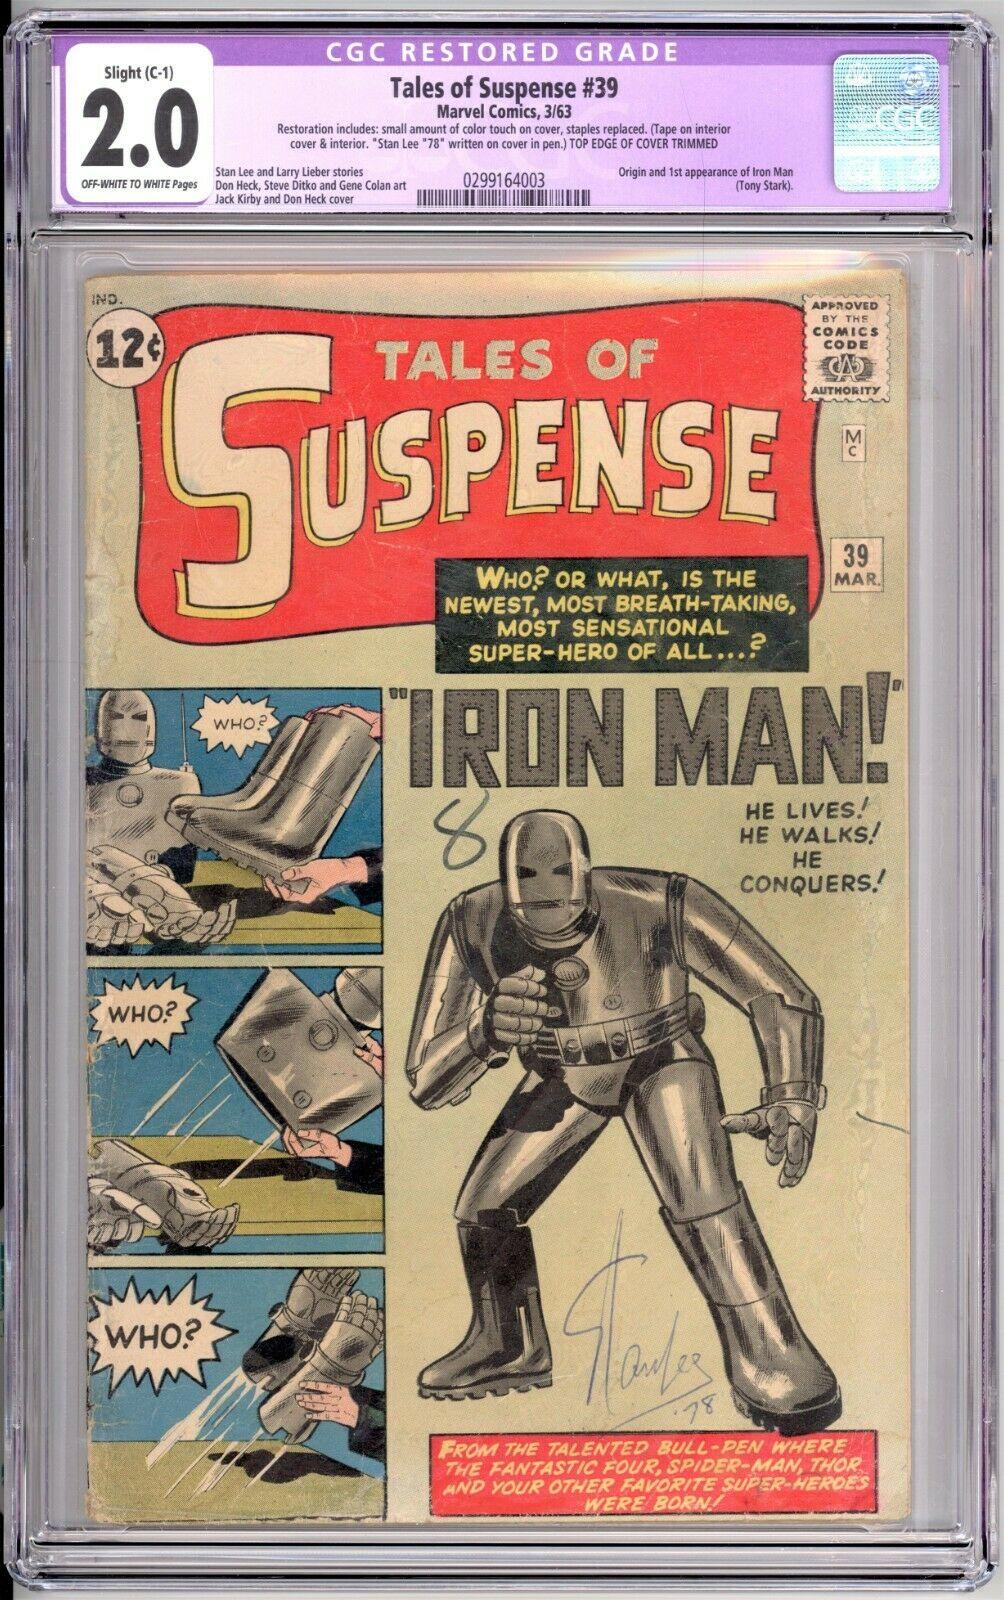 Tales of Suspense 39 CGC 20 C1 Restored 1st Iron Man